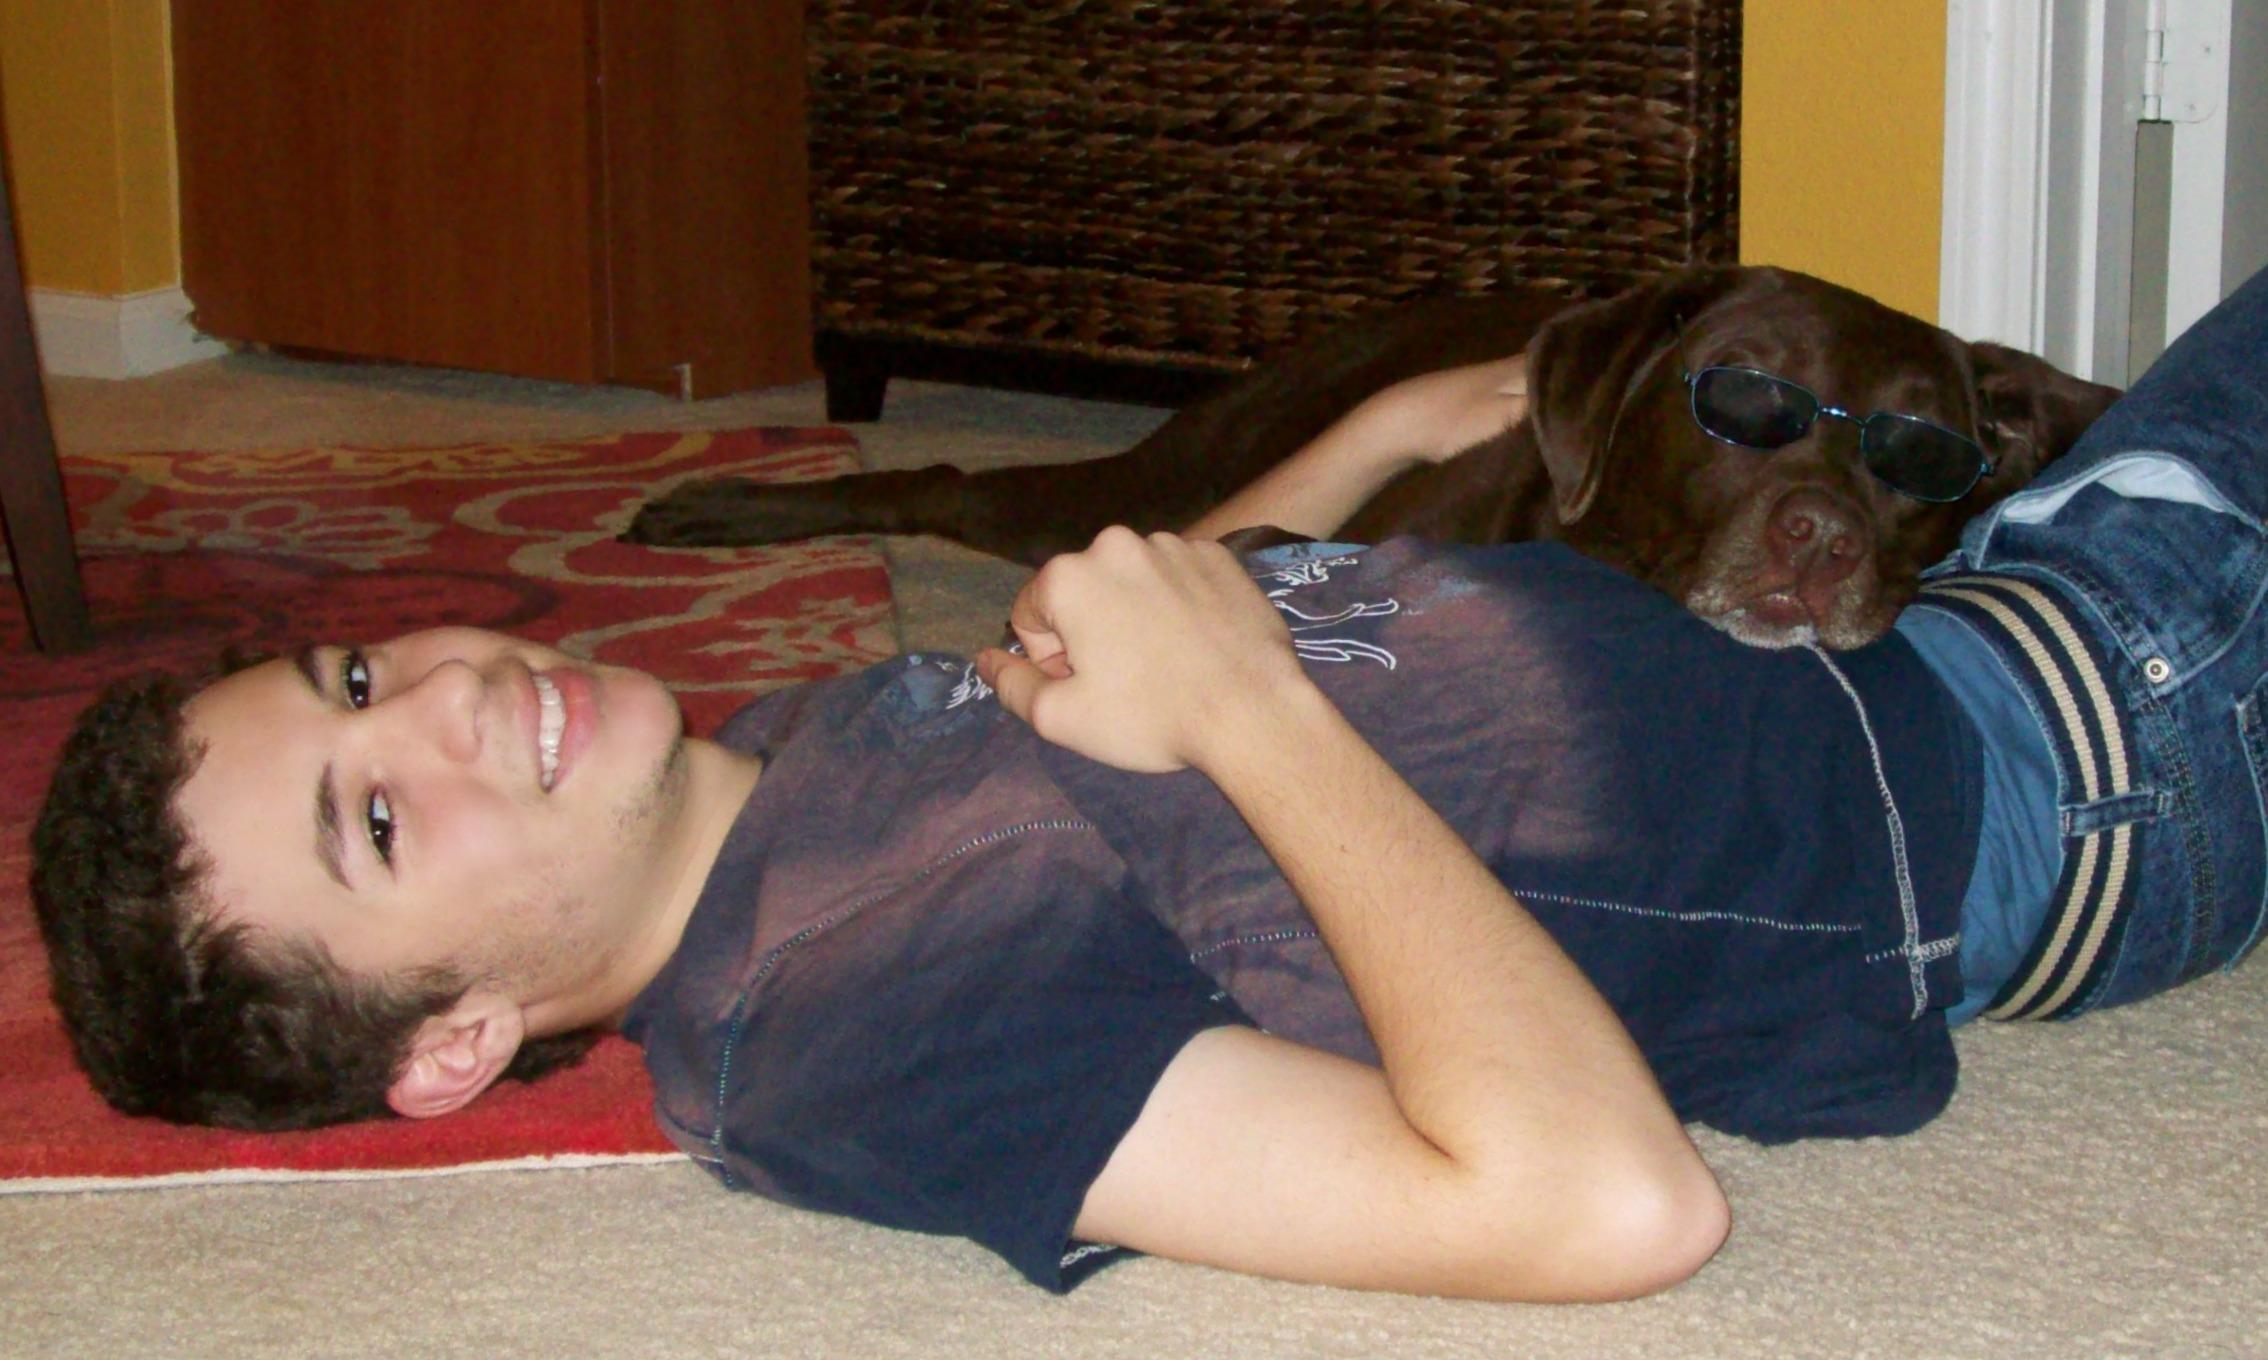 Bailey-Alec-Cary-Apt-2010.jpg